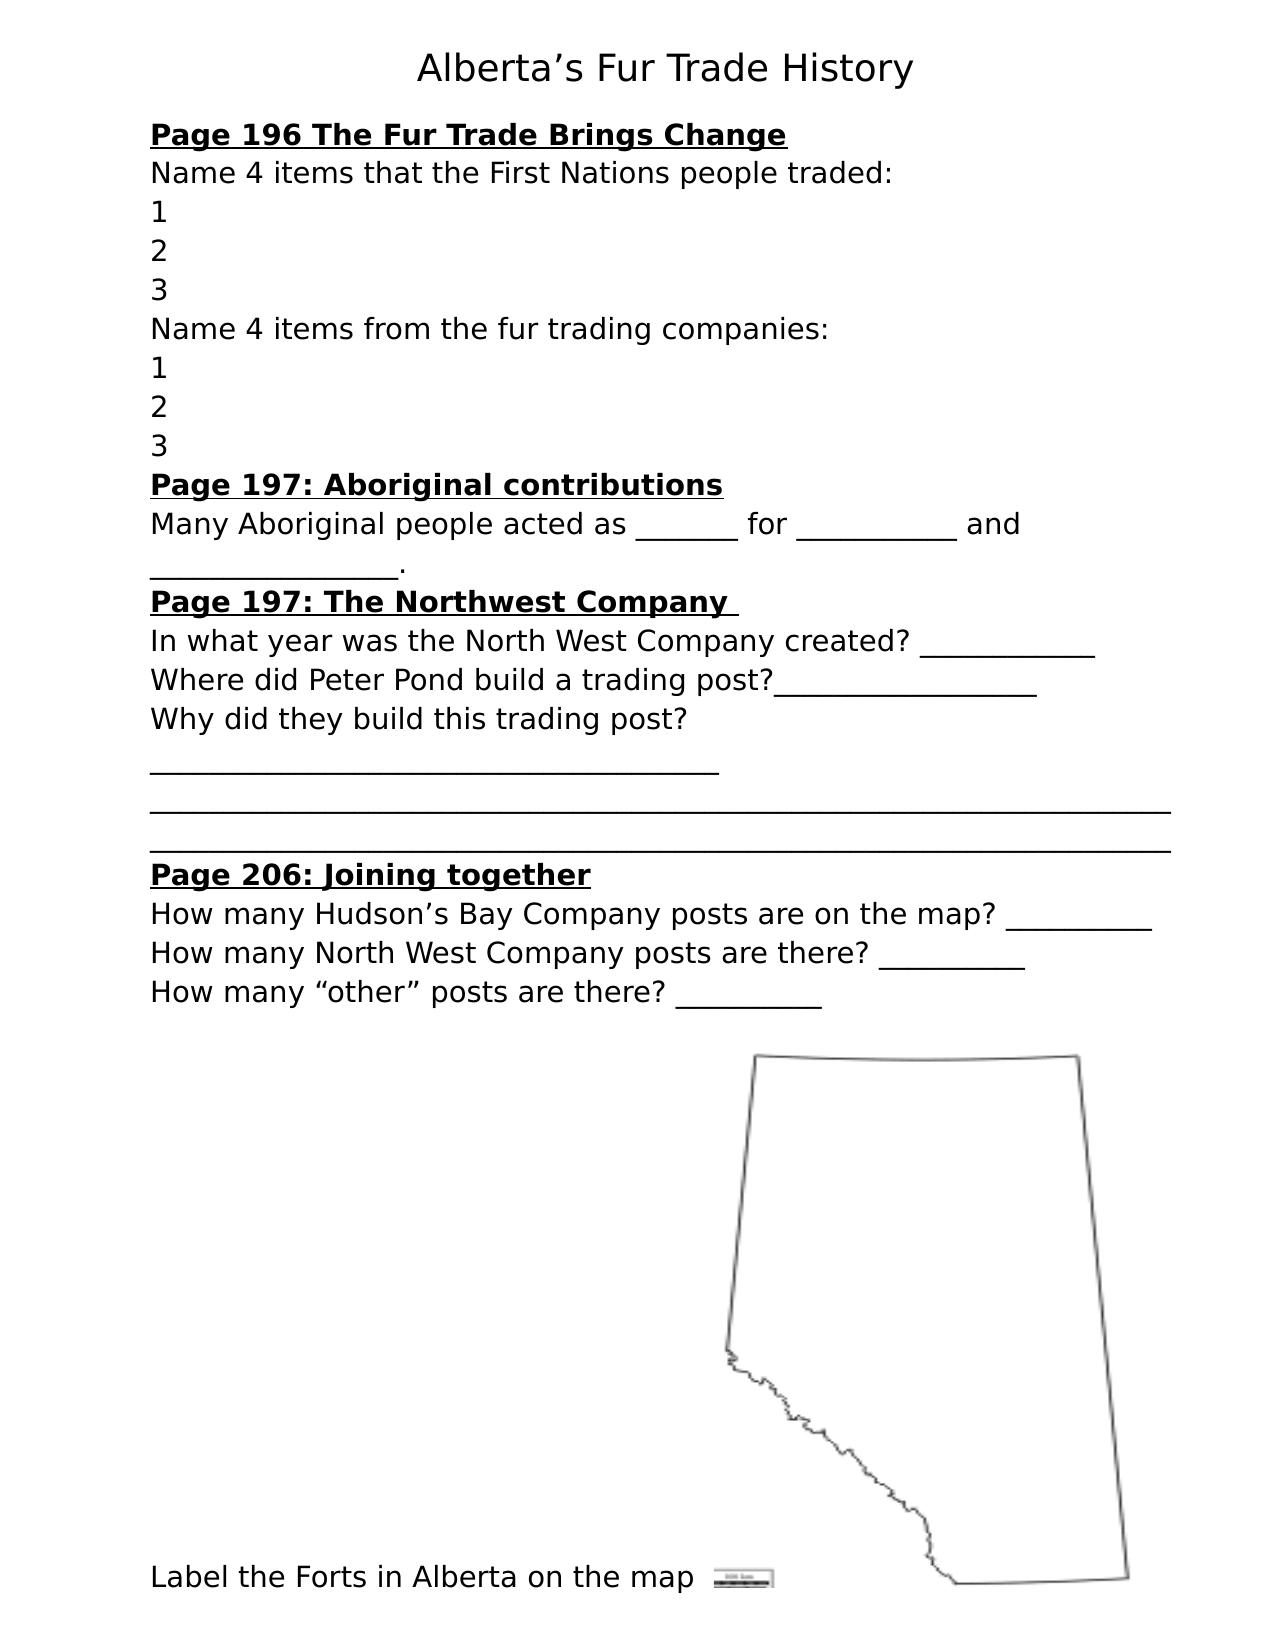 Our Alberta Textbook Fur Trade Resource Preview   Social studies [ 1651 x 1275 Pixel ]